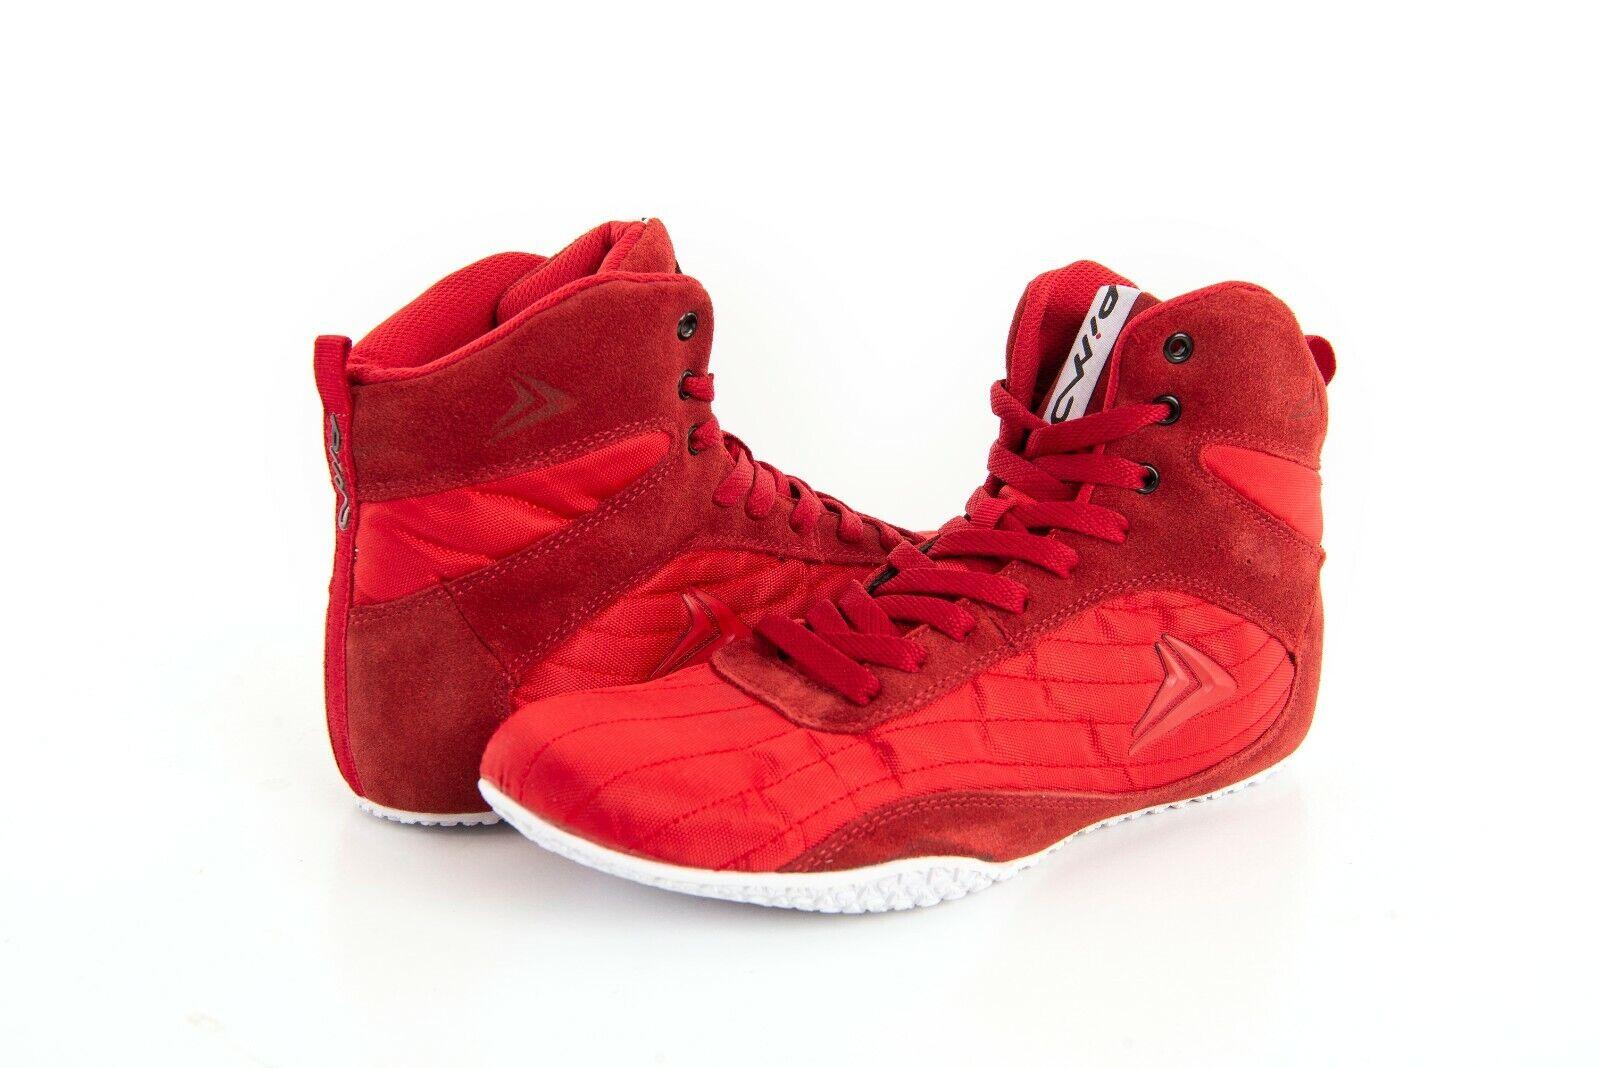 PIMD rouge X-Core V2 Pour des hommes HIGH TOP GYM chaussures bottes WEIGHT LIFTING MUSCLE nouveau